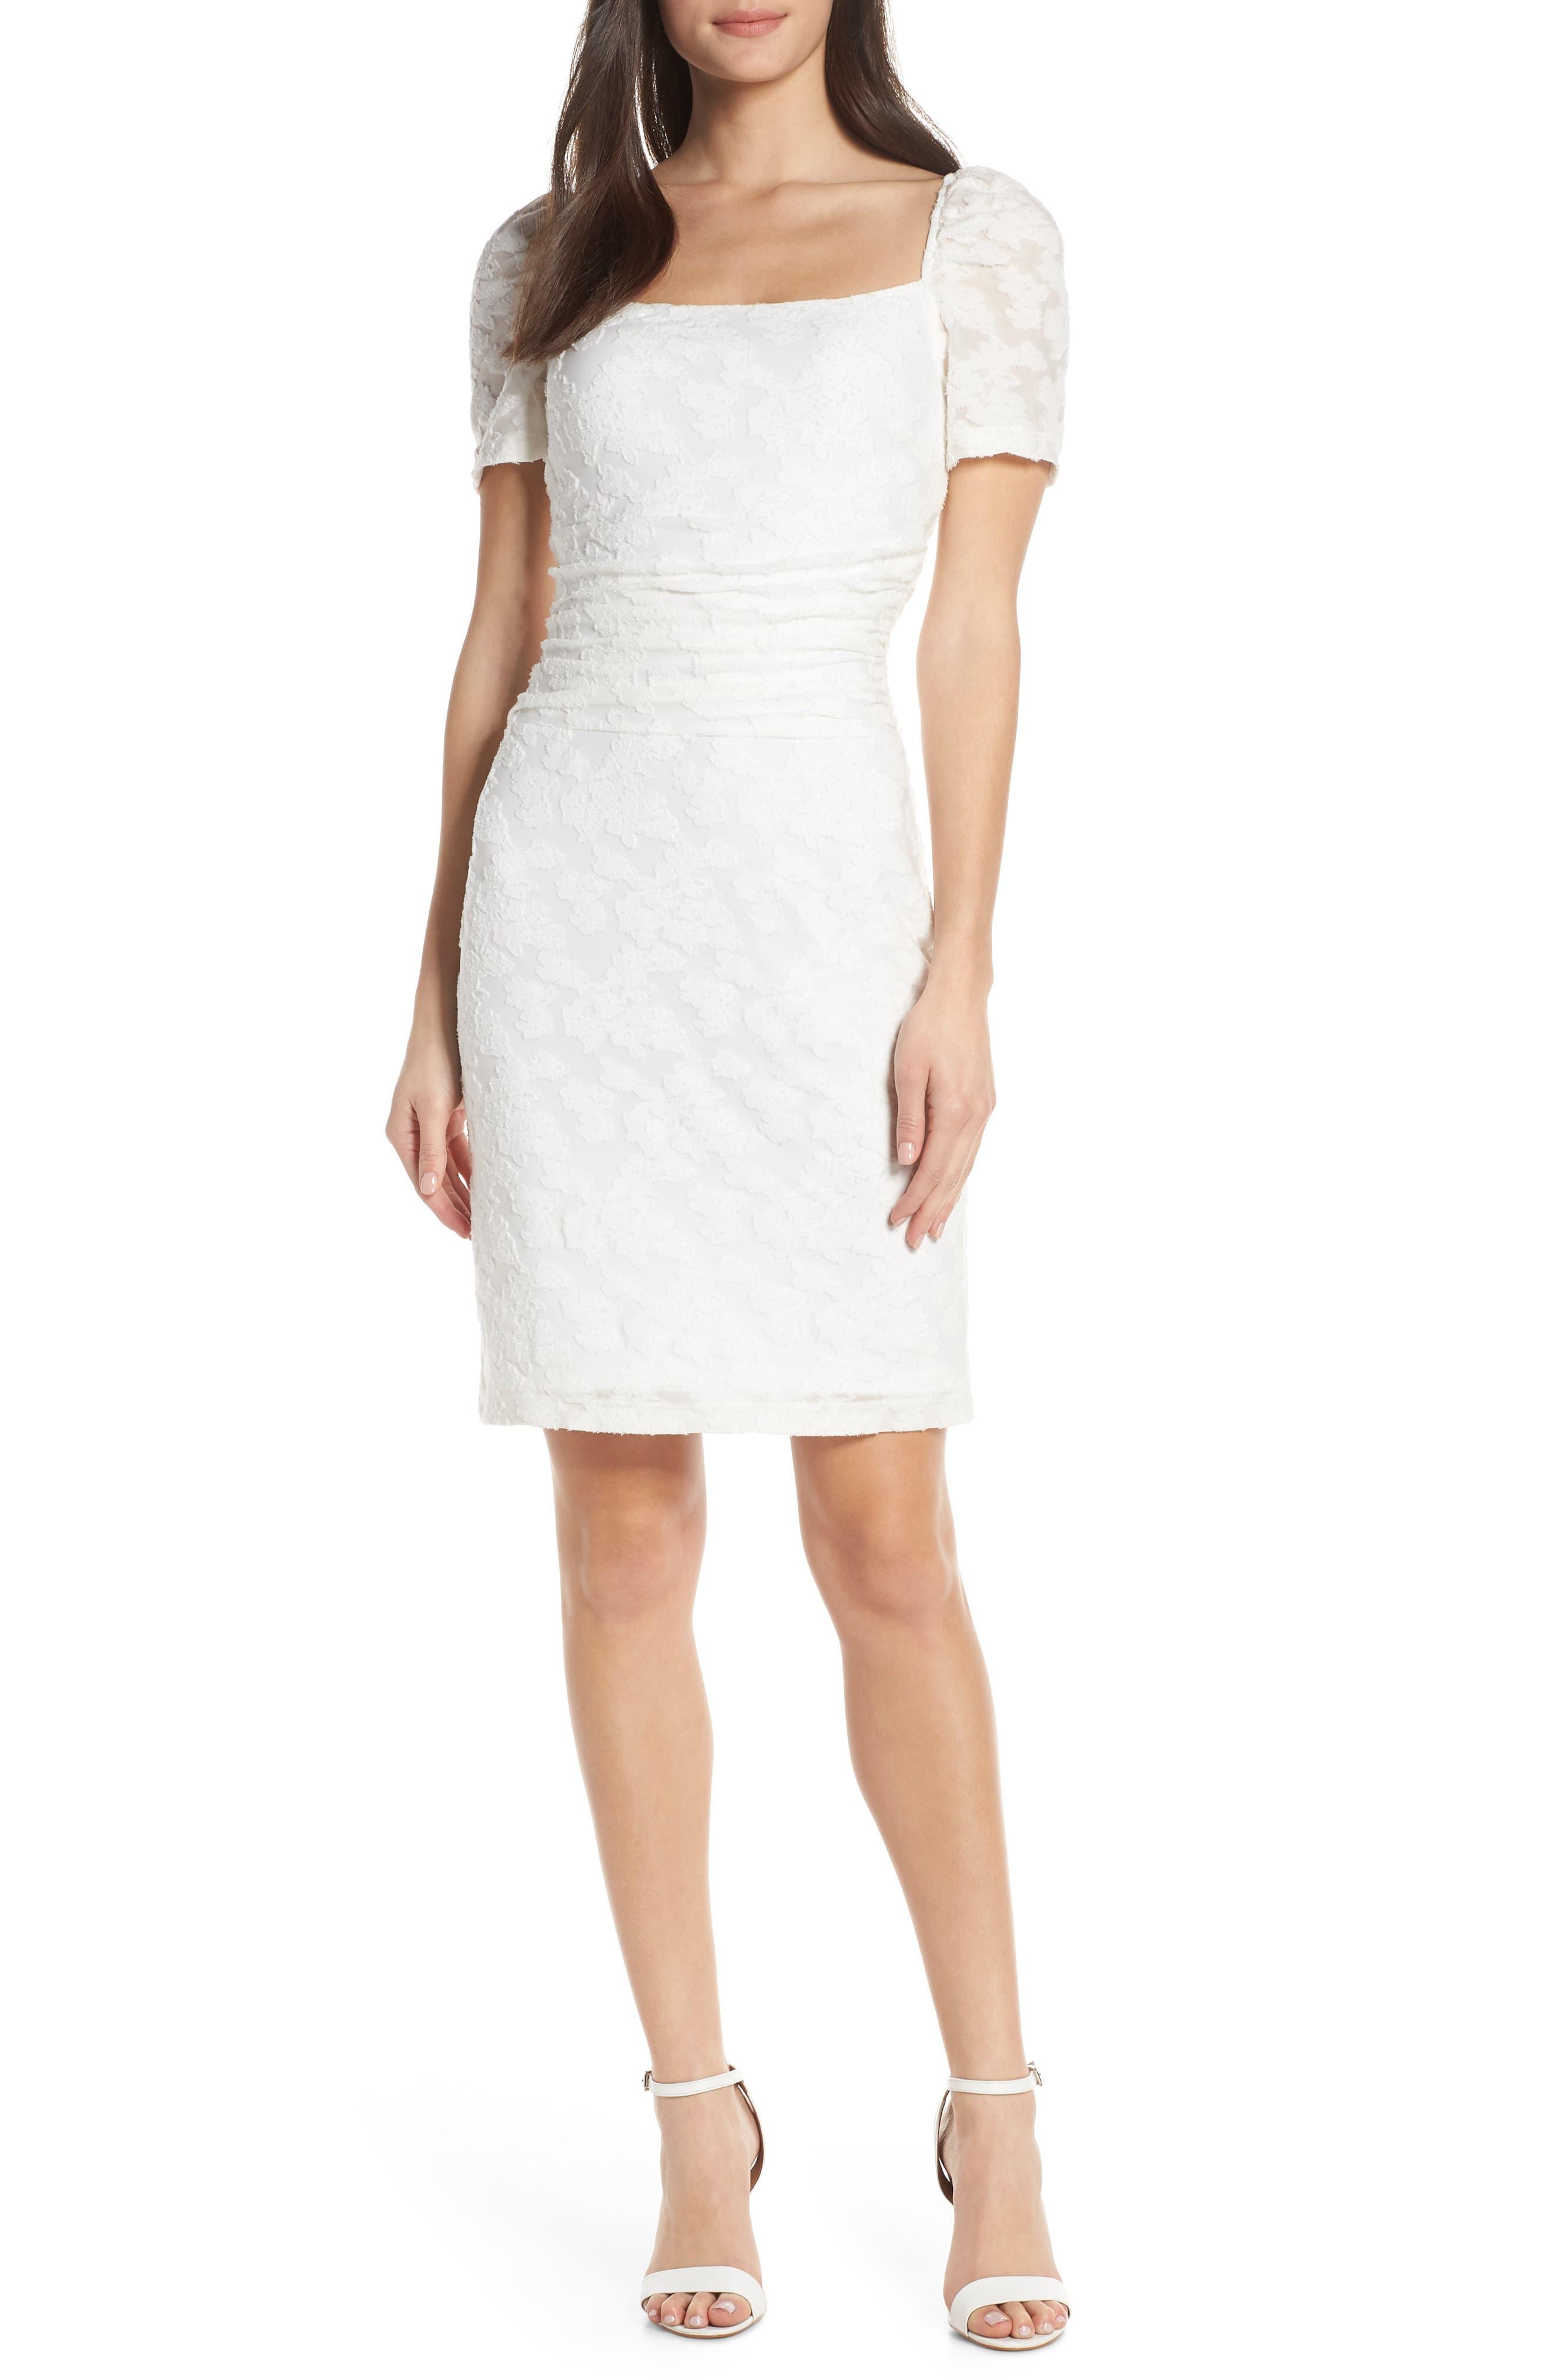 ALI & JAY Big Mistake Short Sleeve Sheath Dress, Main, color, WHITE FLORAL